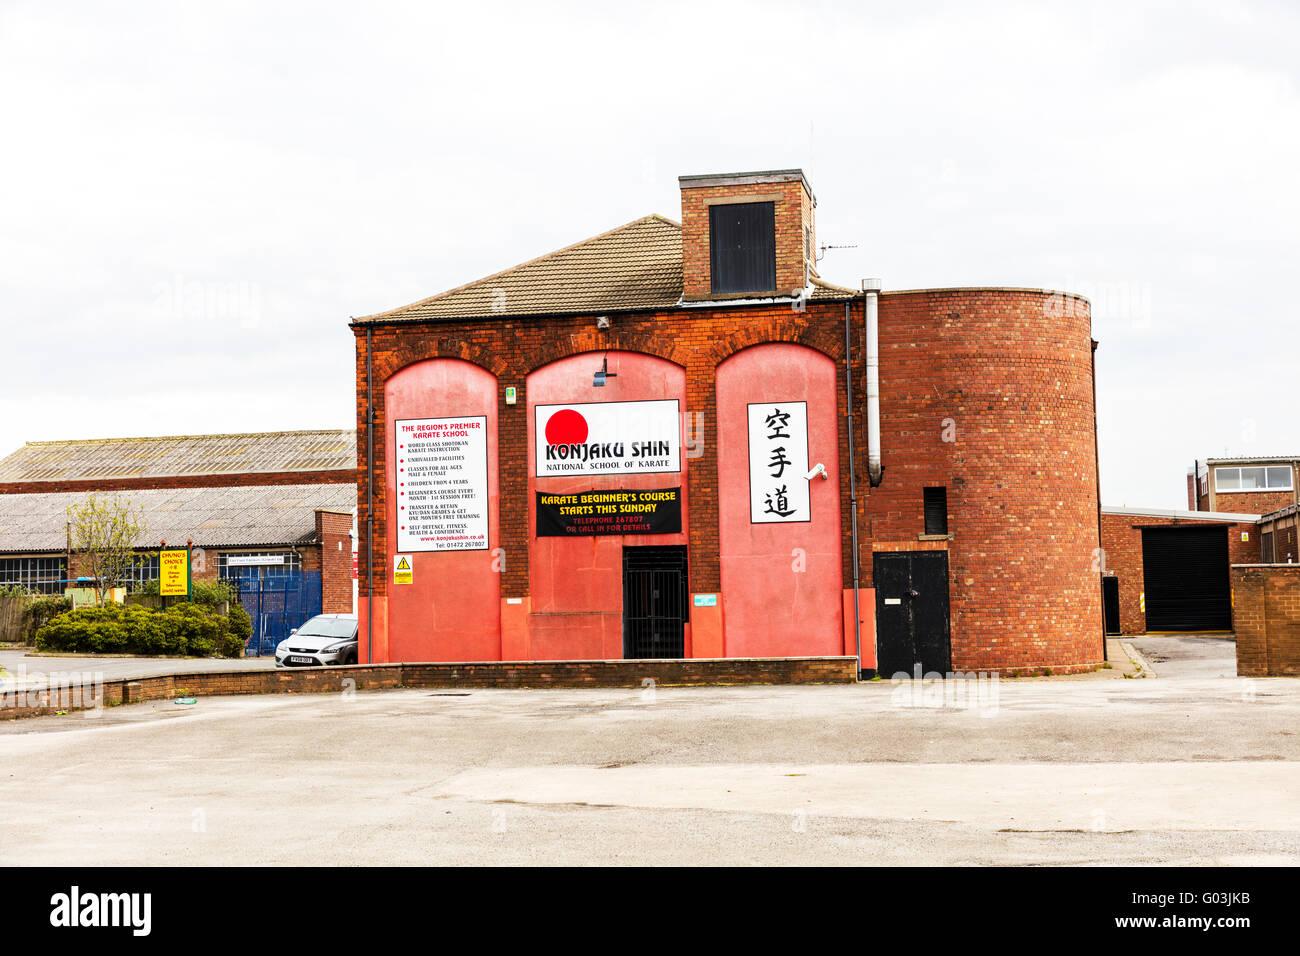 Karate school building signs shop sign name Konjaku Shin exterior logo Grimsby Town UK England - Stock Image